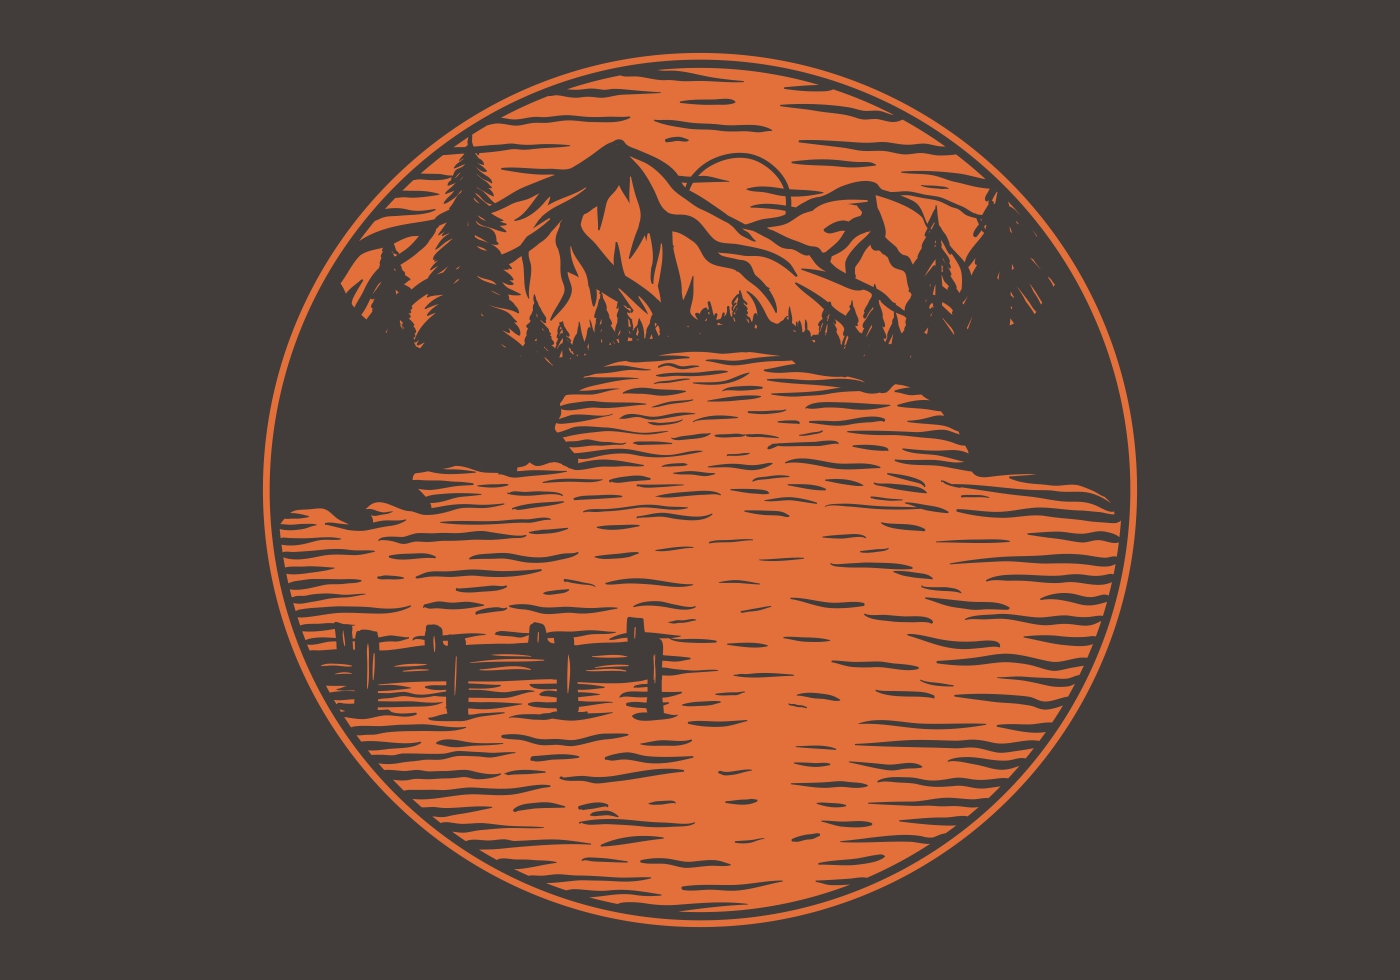 Emblema circular de vistas al lago